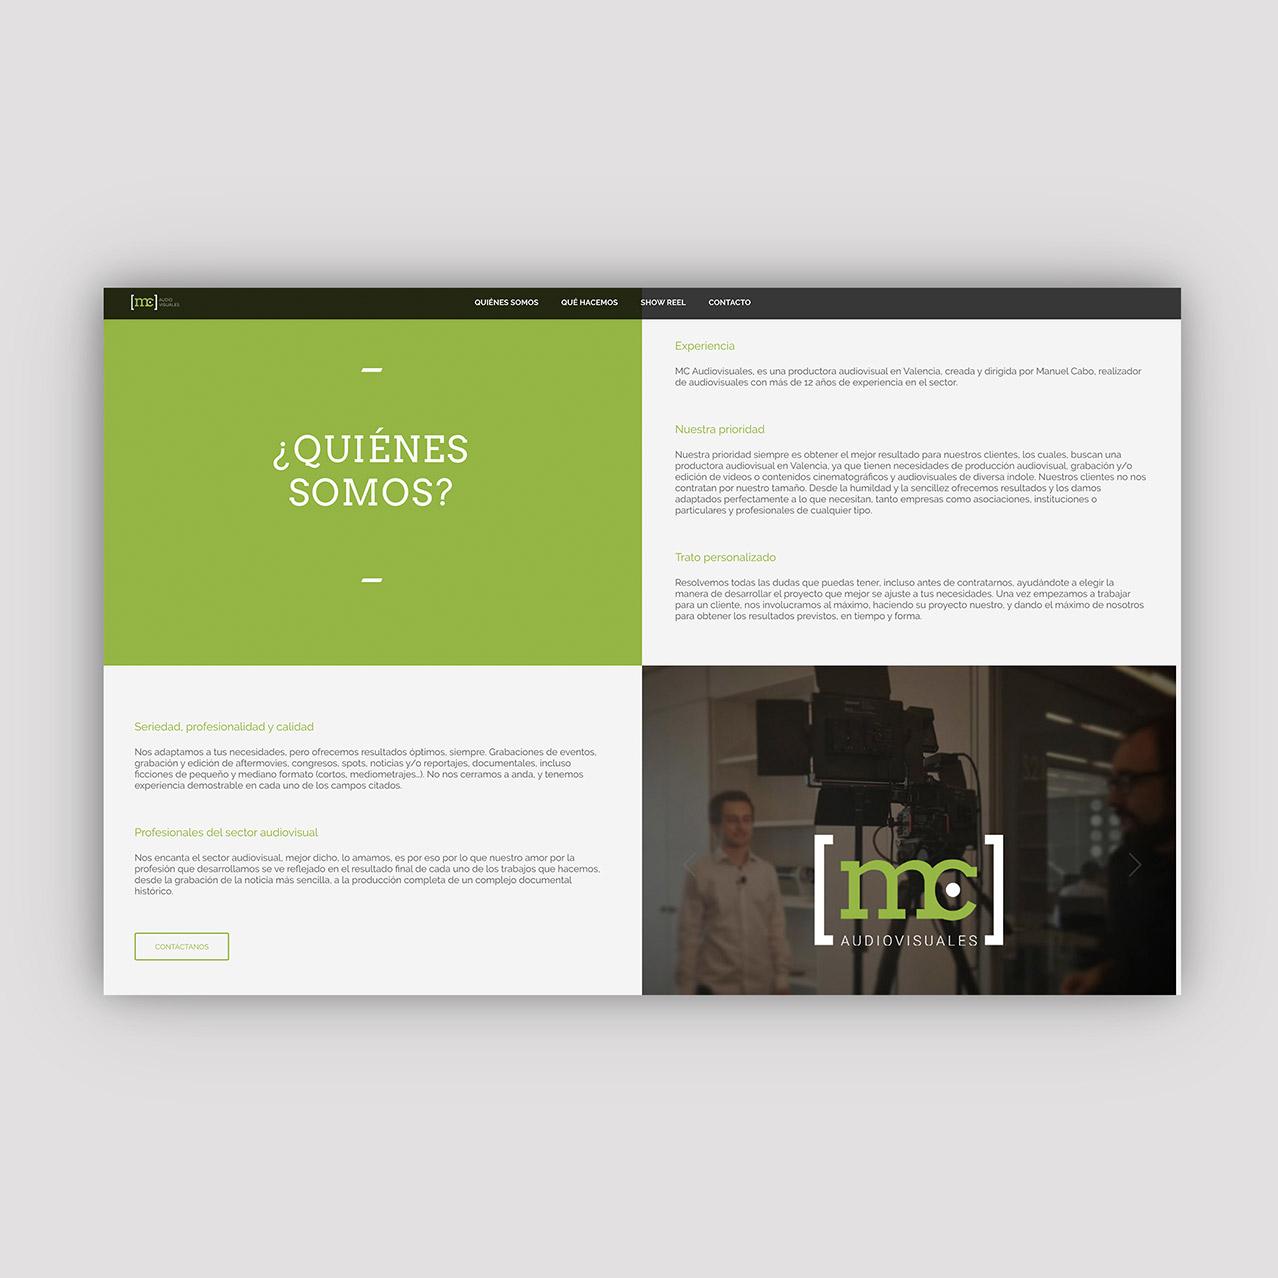 pagina-web-empresa-audiovisuales